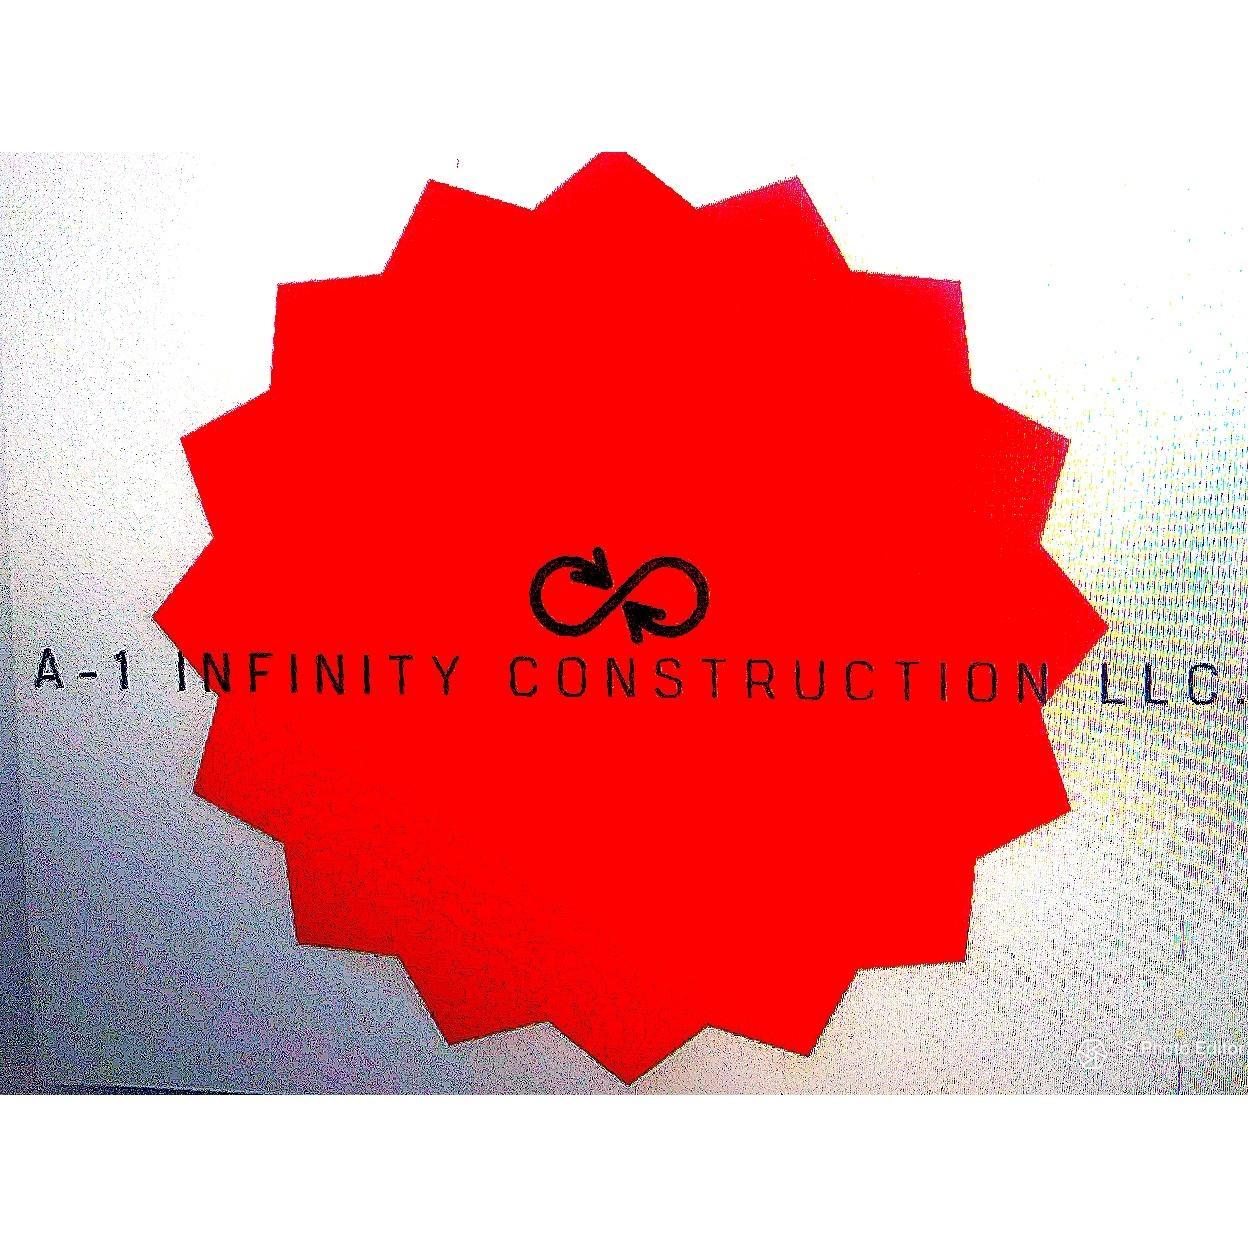 A-1 Infinity Construction LLC